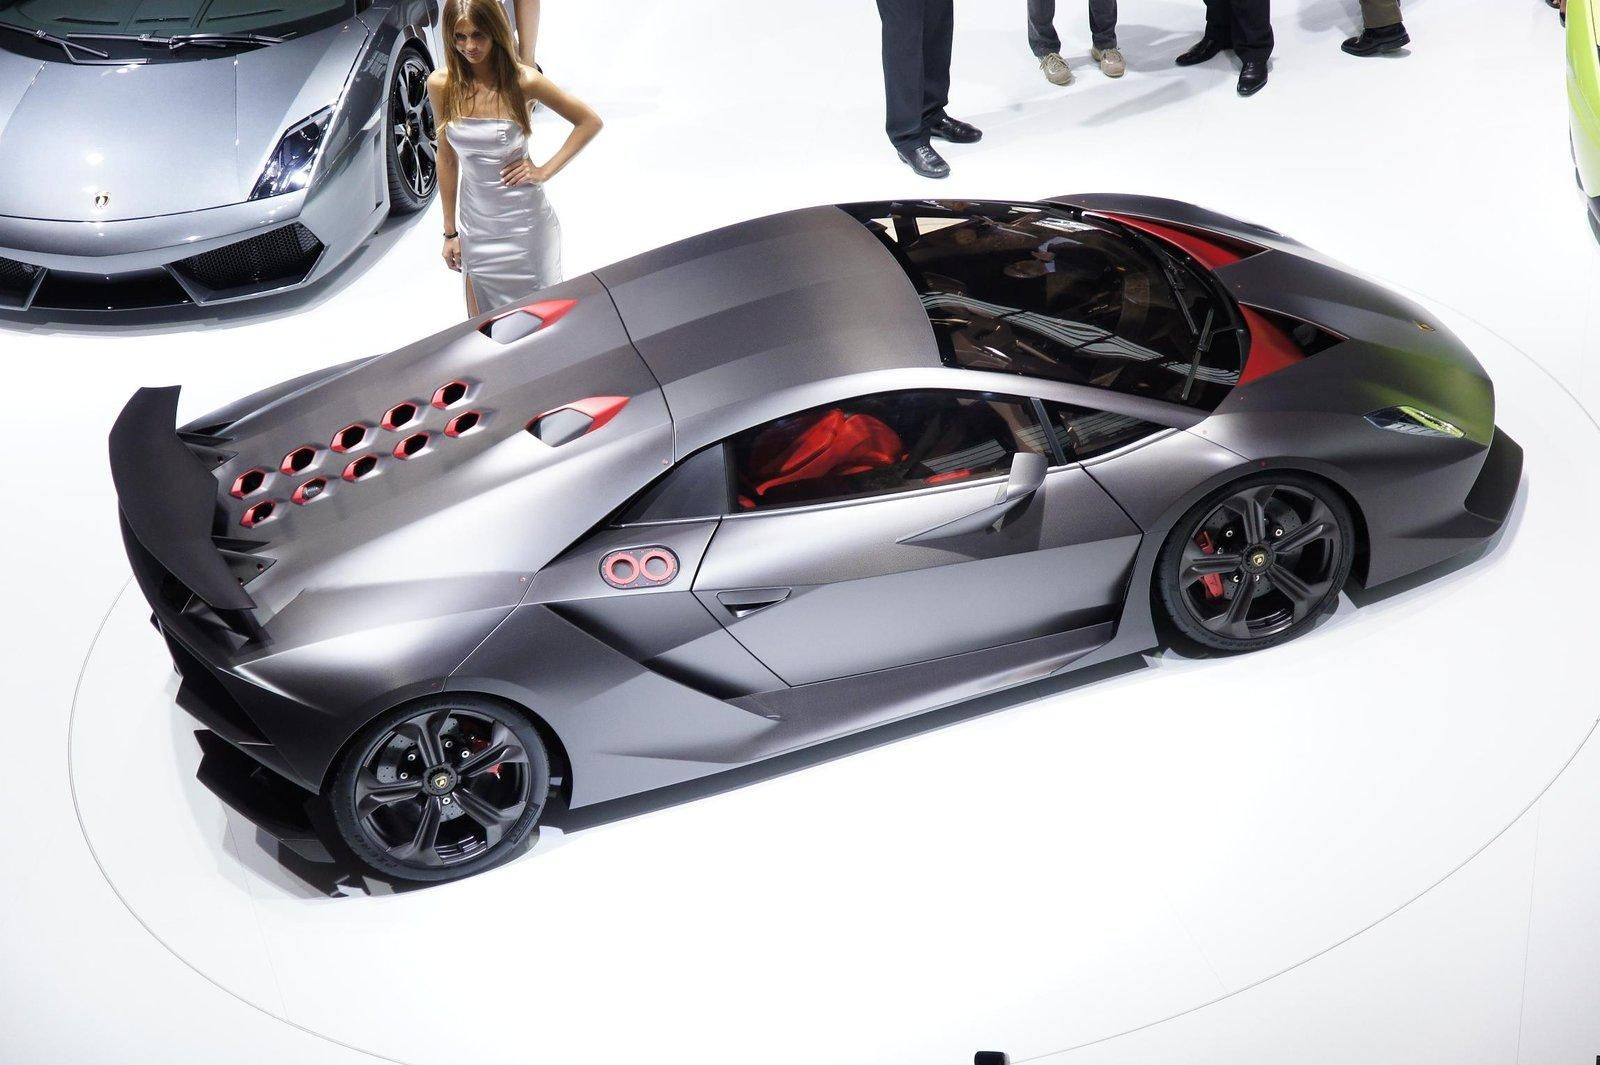 sesto elemento lamborghini | Lamborghini Sesto Elemento « Todolamborghini